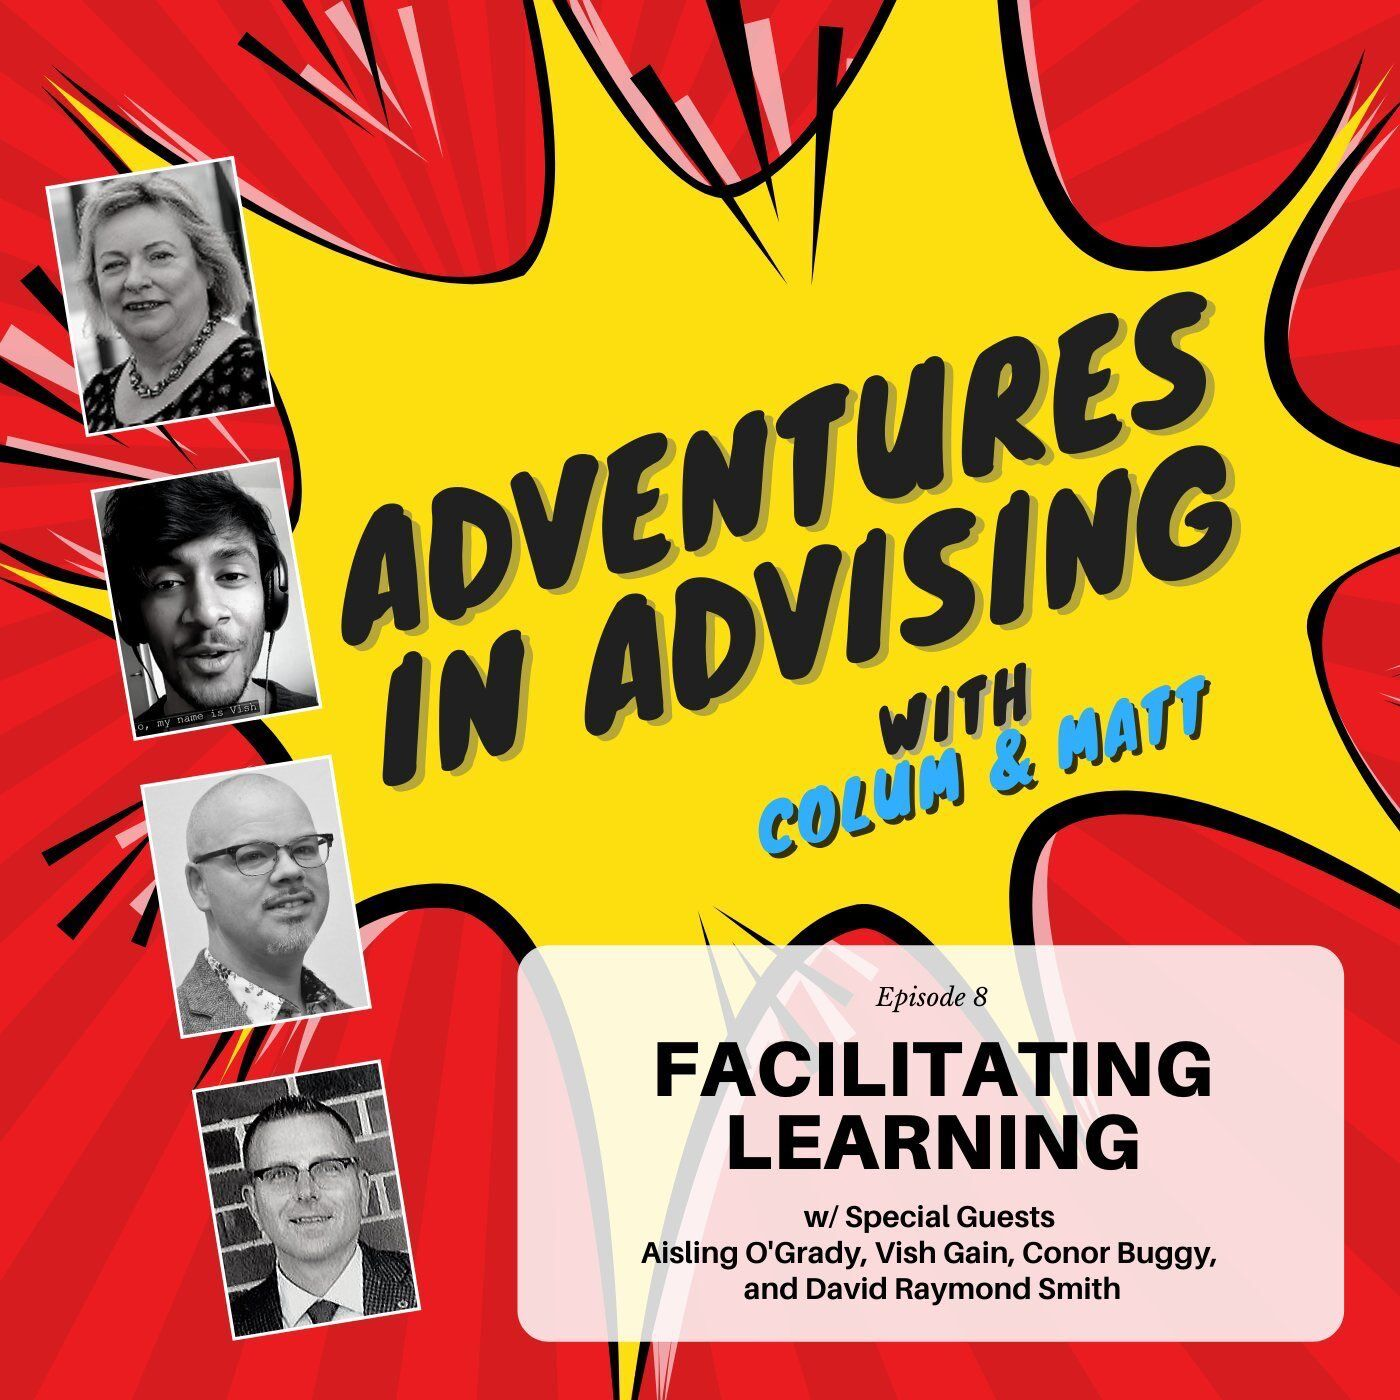 Facilitating Learning - Adventures in Advising